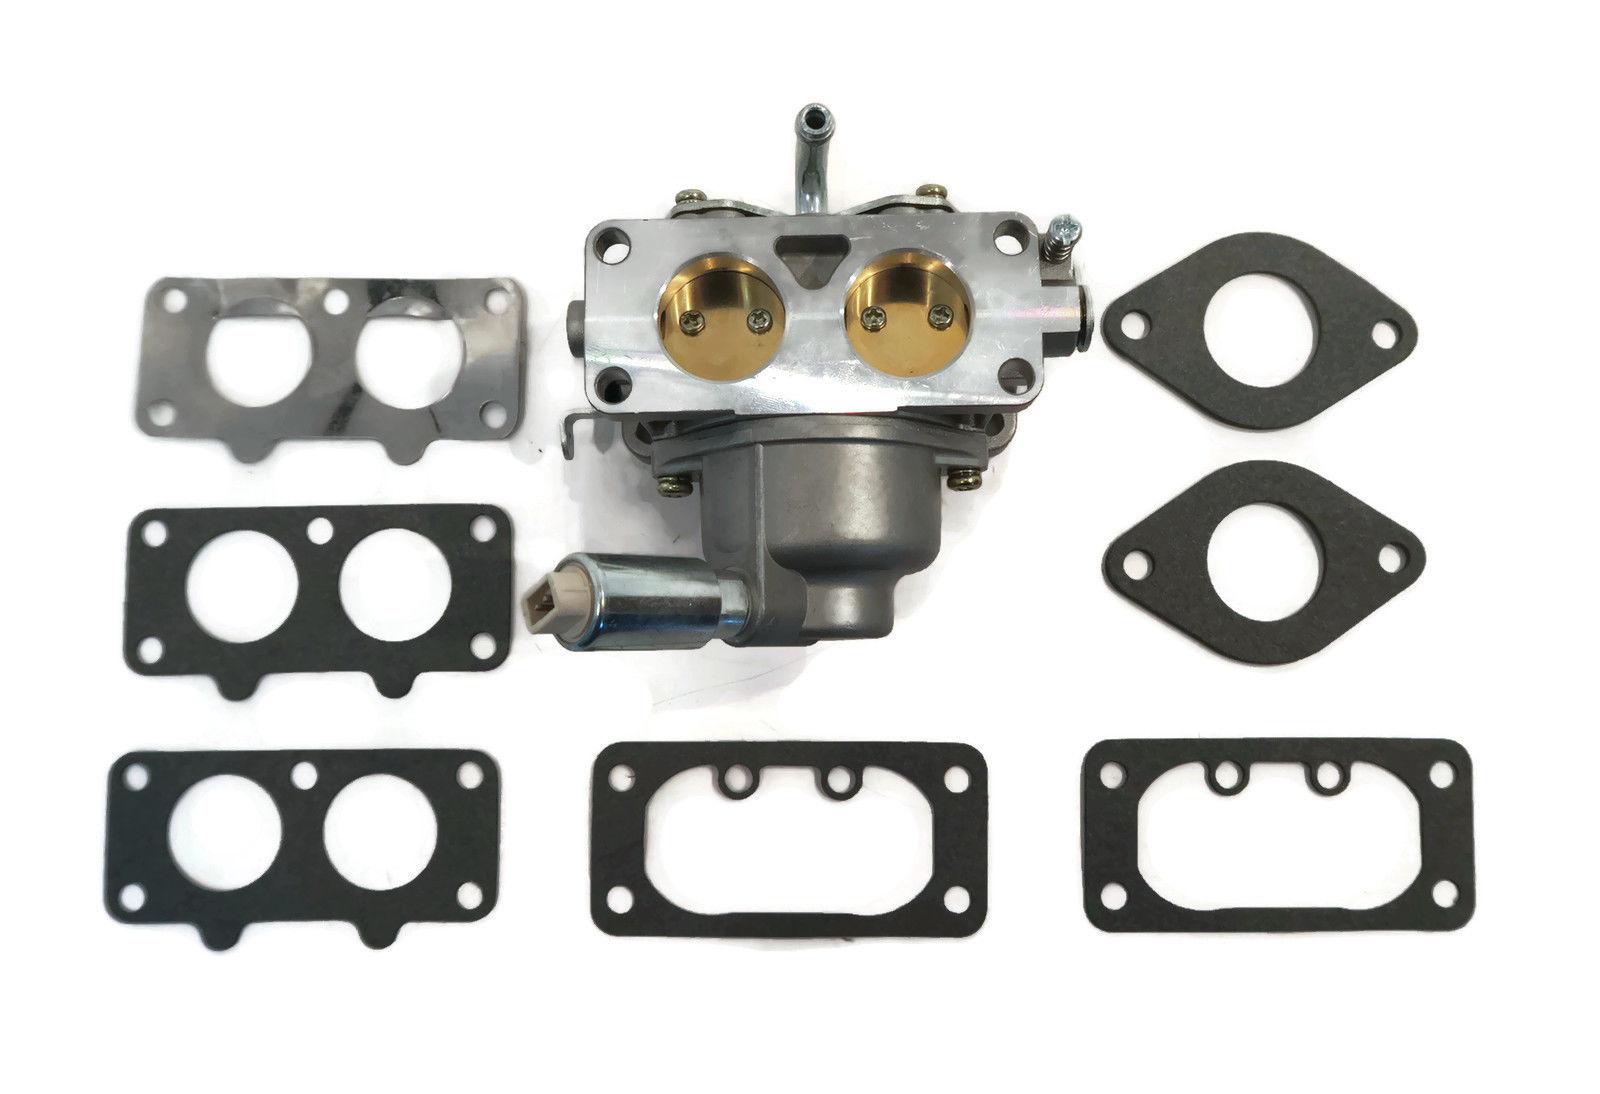 John Deere La Carburetor | John Deere Parts: John Deere